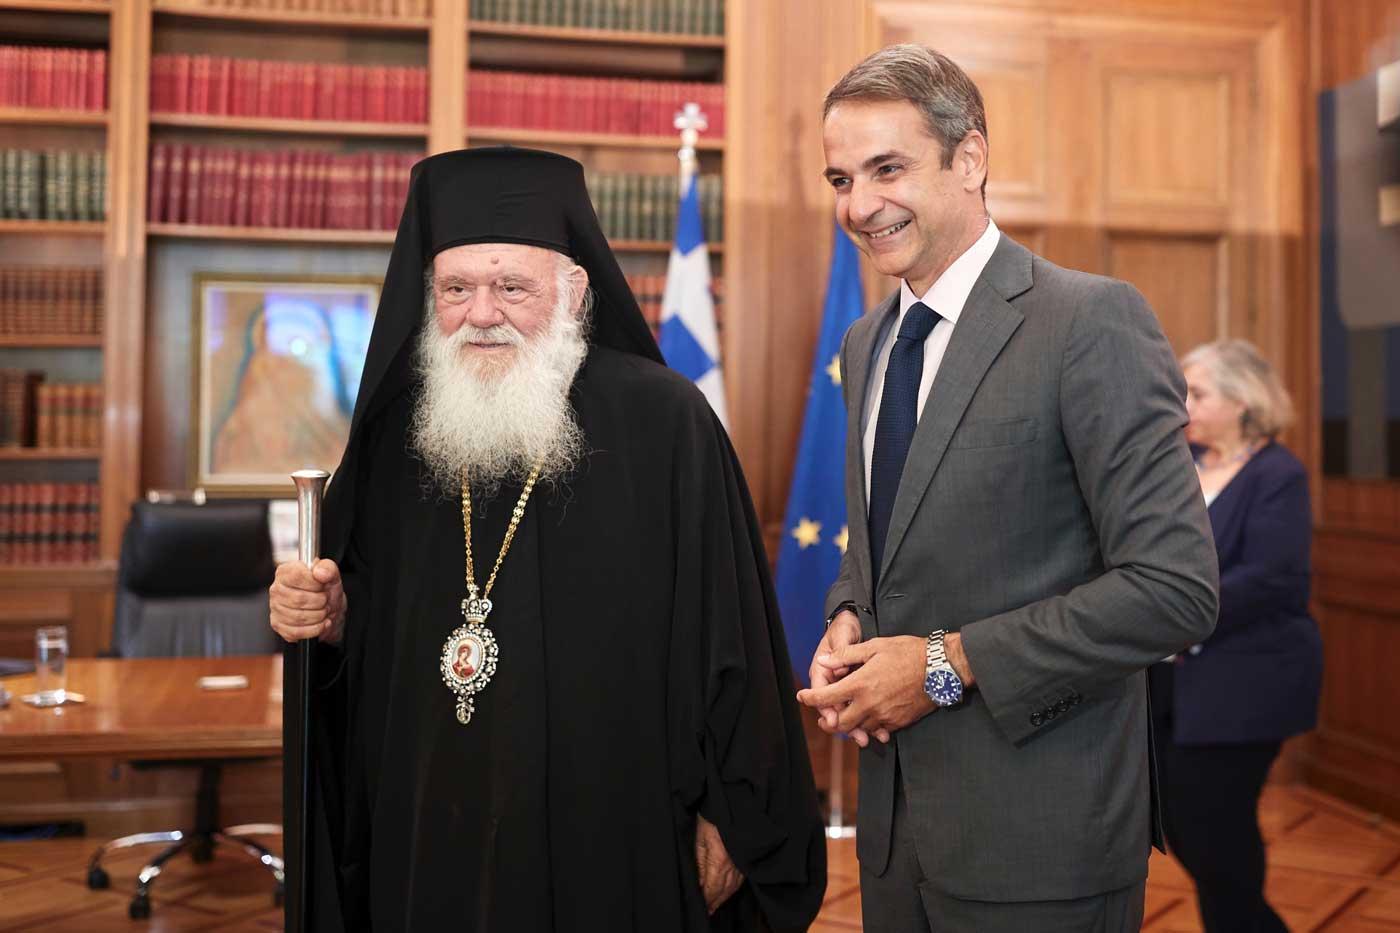 You are currently viewing Ο Πρωθυπουργός επισκέφθηκε τον Αρχιεπίσκοπο Ιερώνυμο